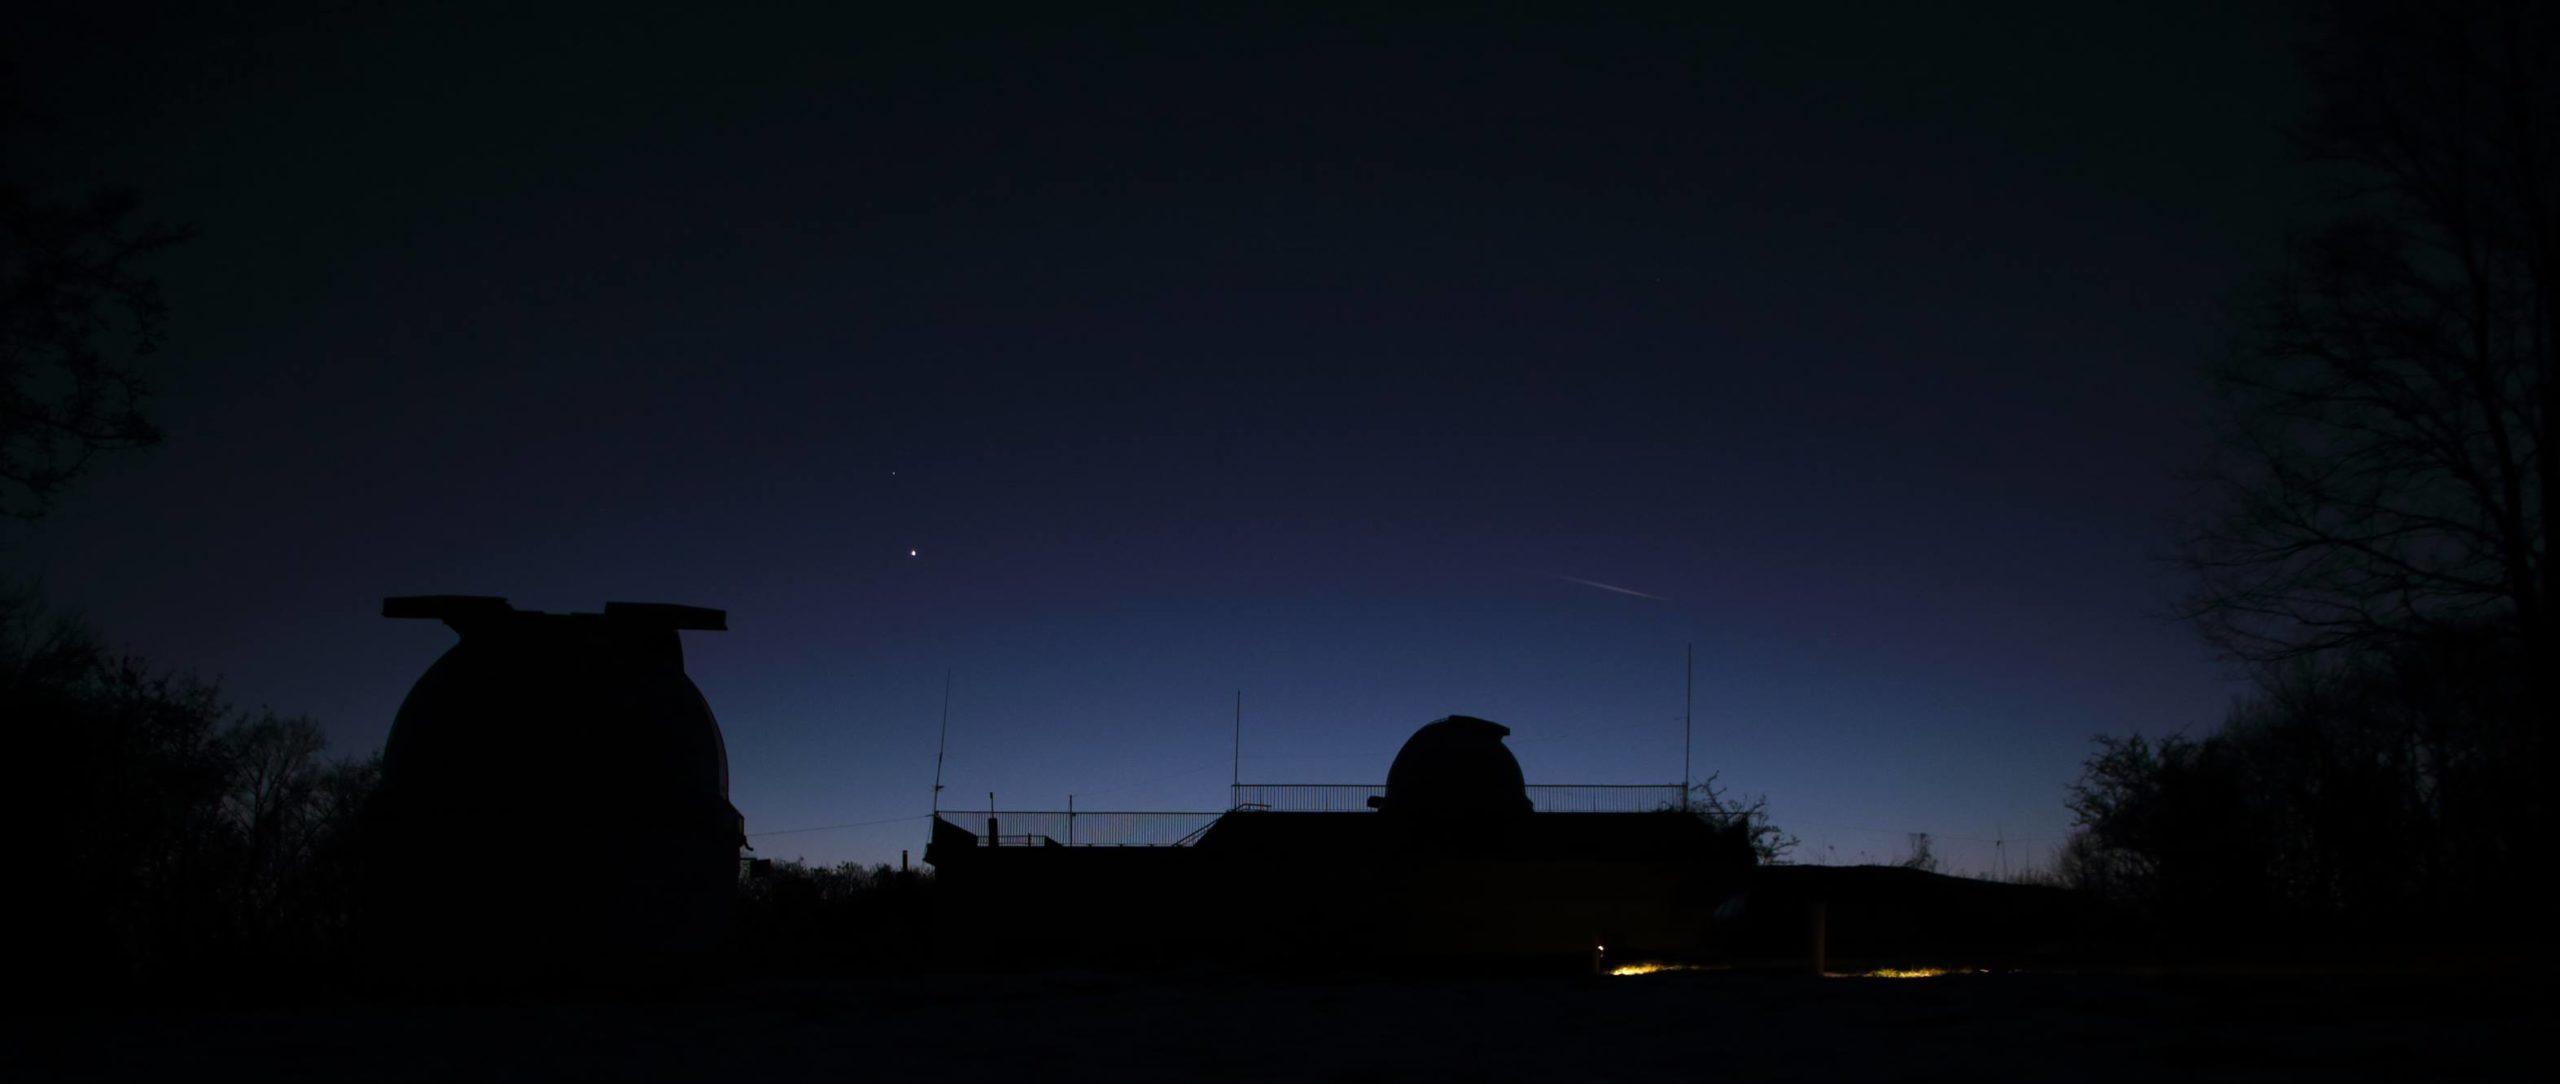 Obserwatorium Astronomiczne UJ